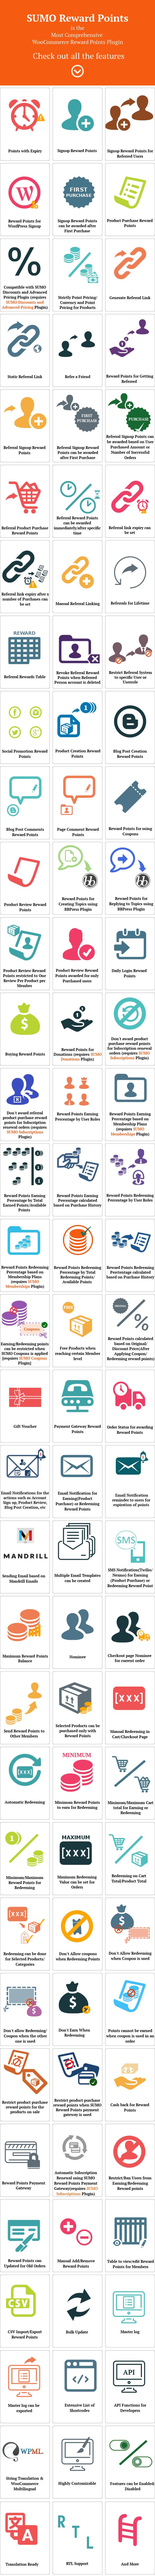 SUMO Reward Points - WooCommerce Reward System - 3